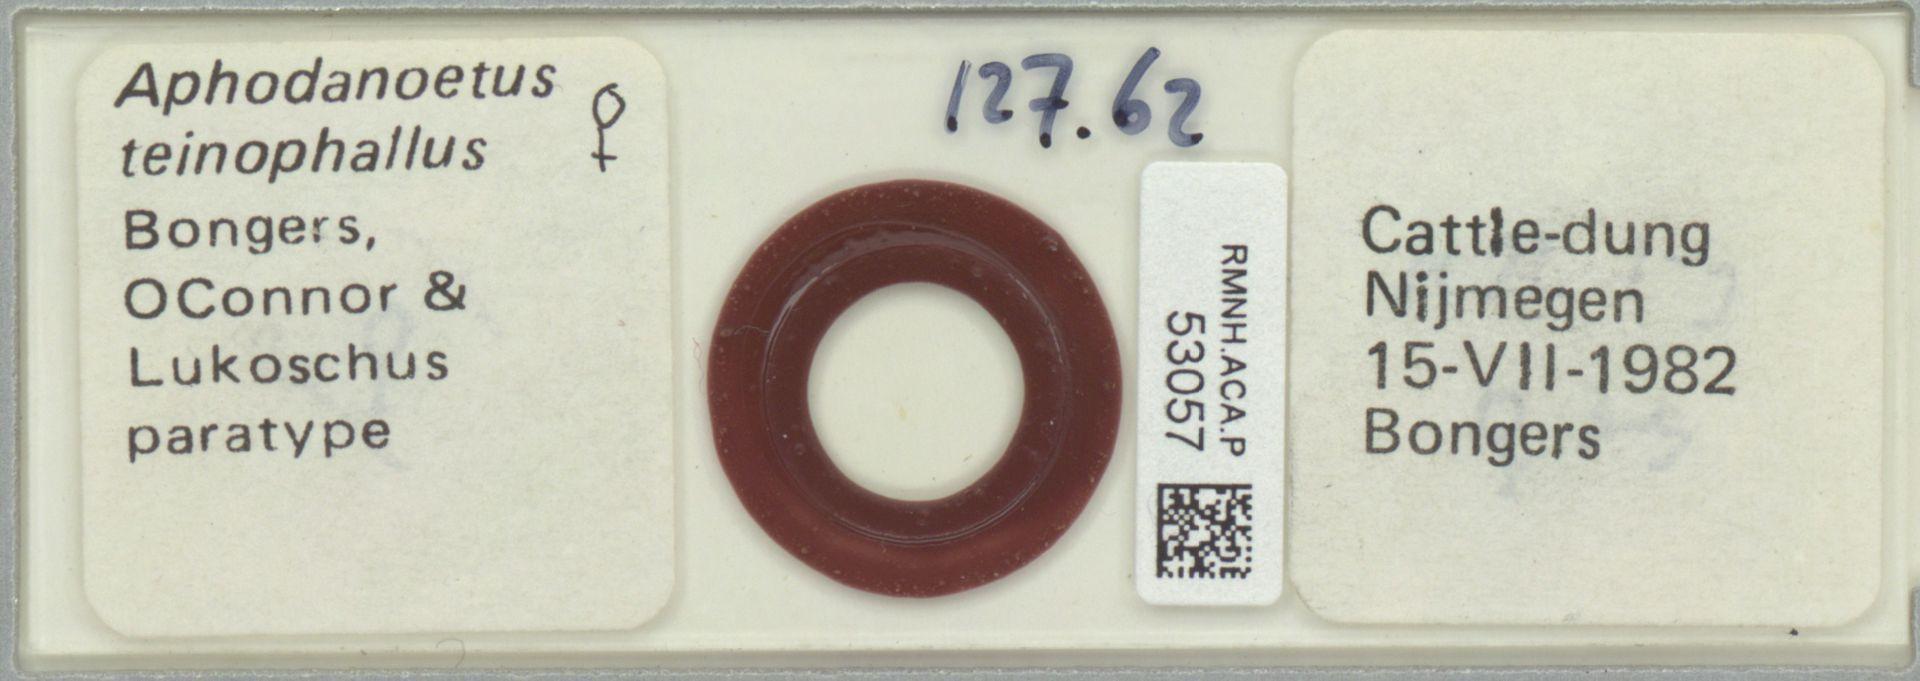 RMNH.ACA.P.53057 | Aphodanoetus teinophallus Bongers, OConnor & Lukoschus